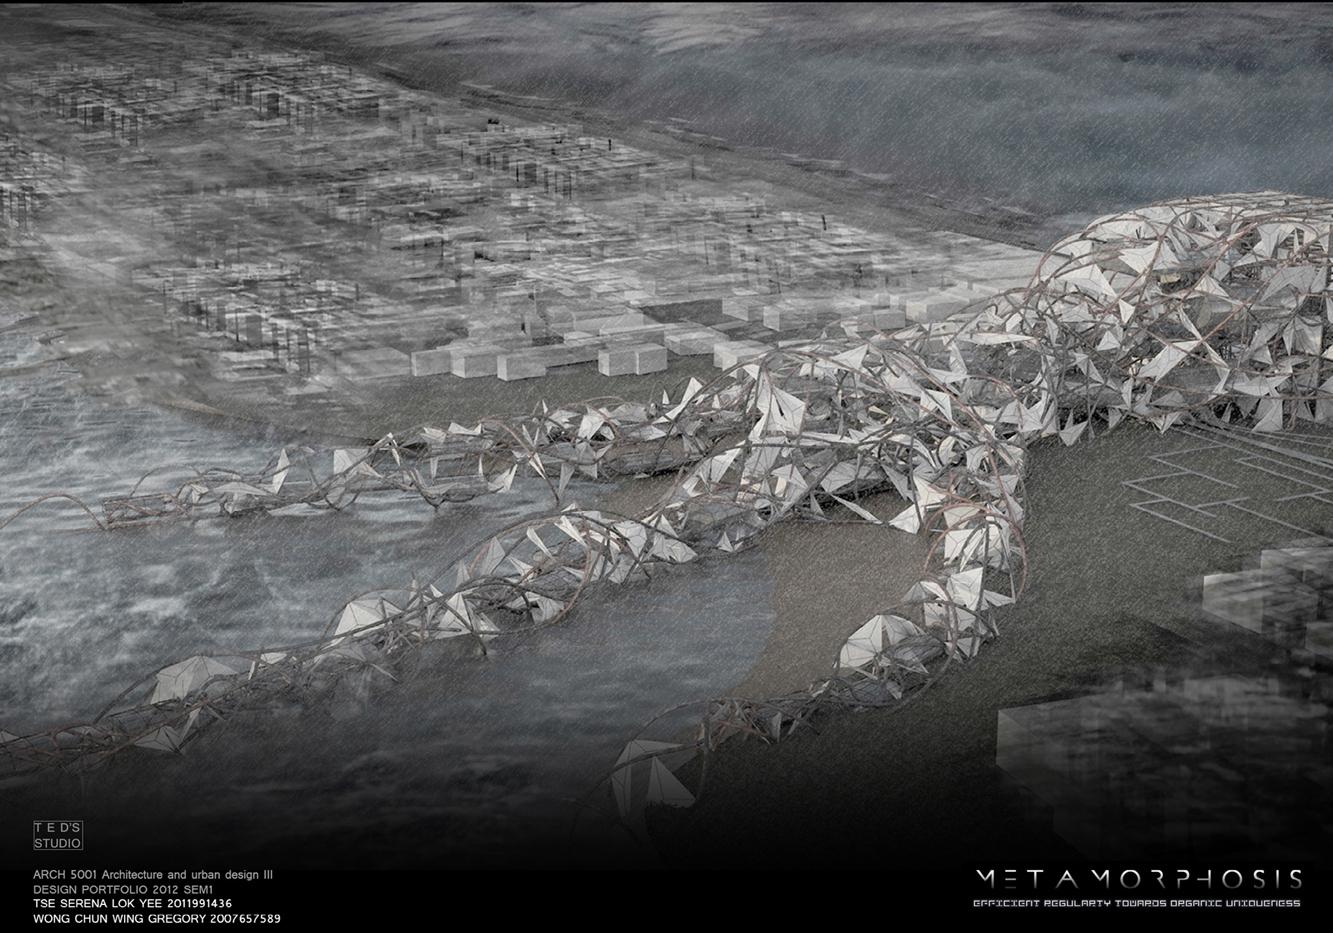 Enlarge Photo: Architecture & Urban Design III (ARCH 5001) 5